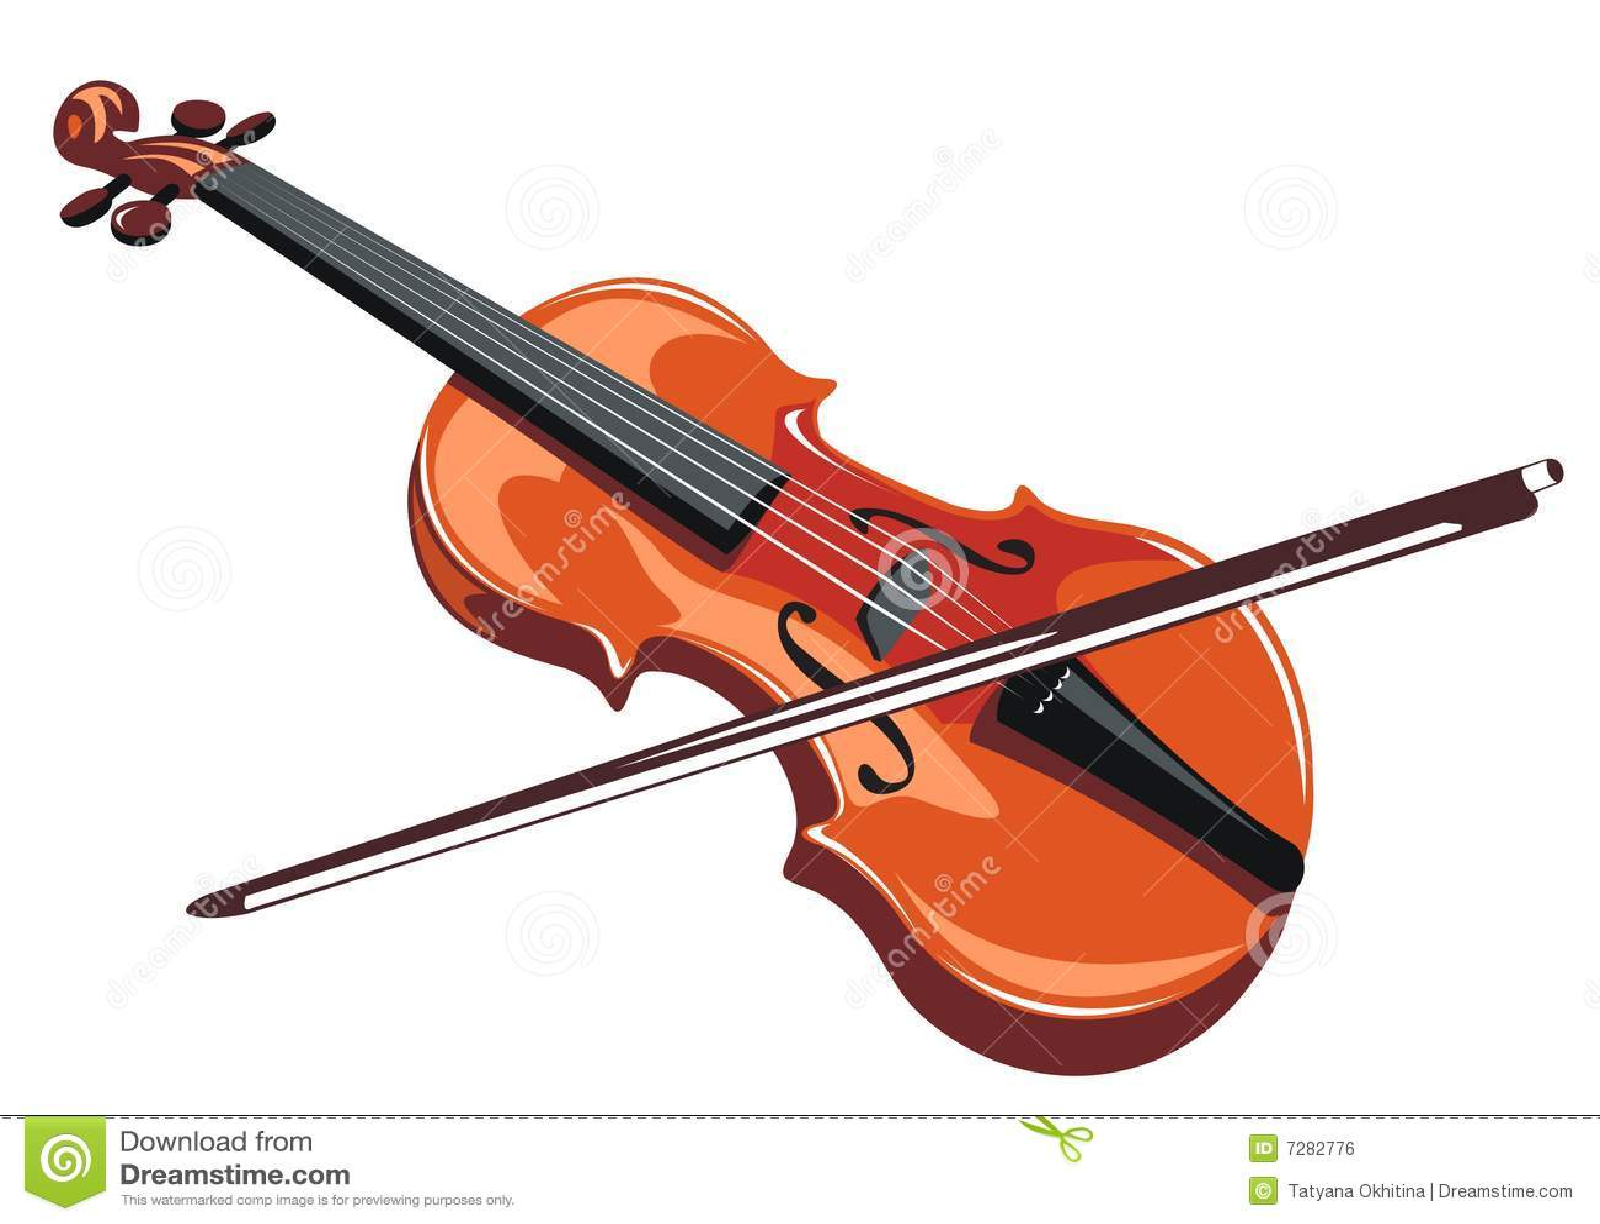 violin royalty free stock image image 7282776 violin clipart transparent violin clip art free